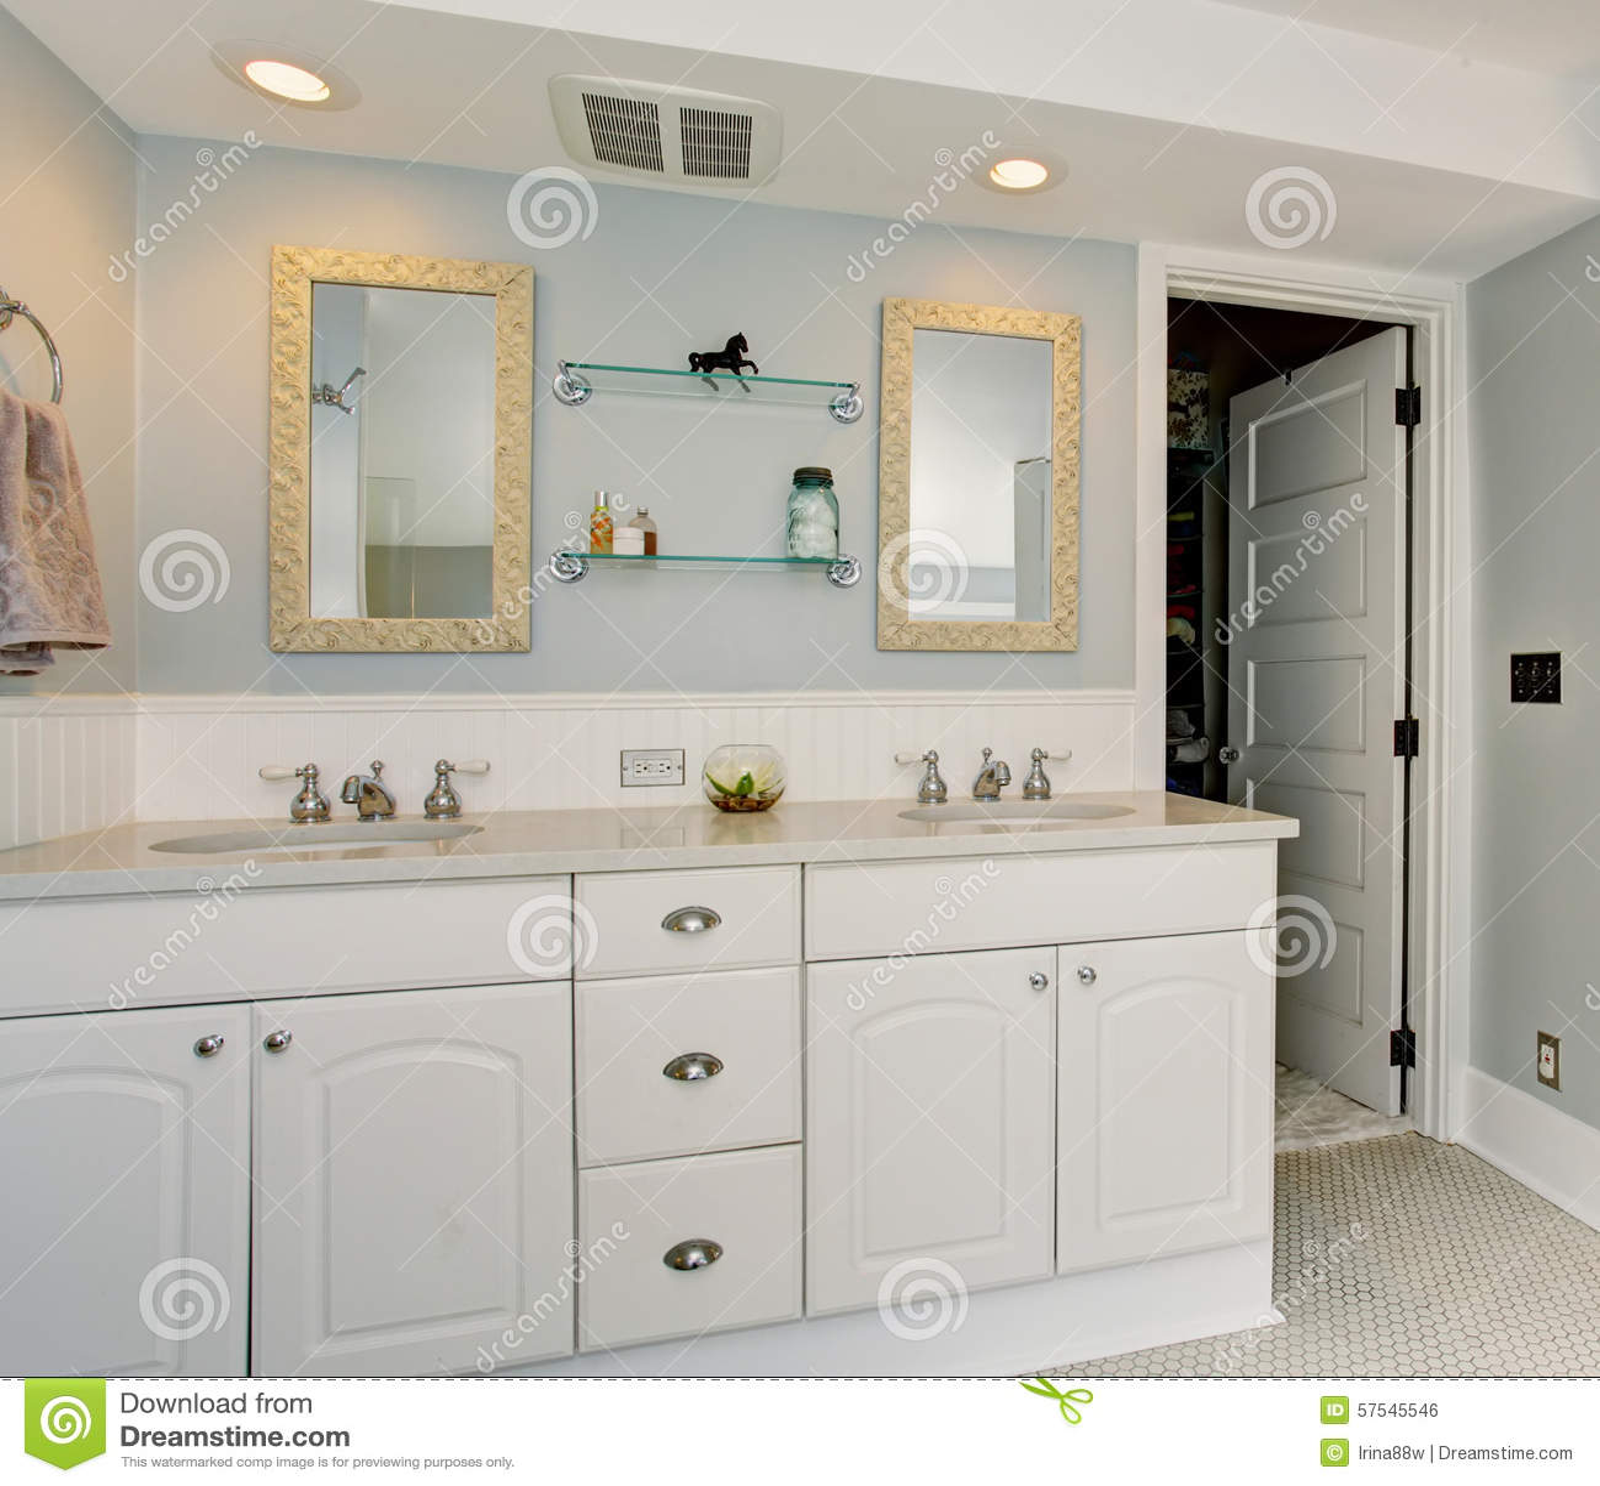 All White Luxury Master Bathroom With Vintage Theme. Stock Photo ...